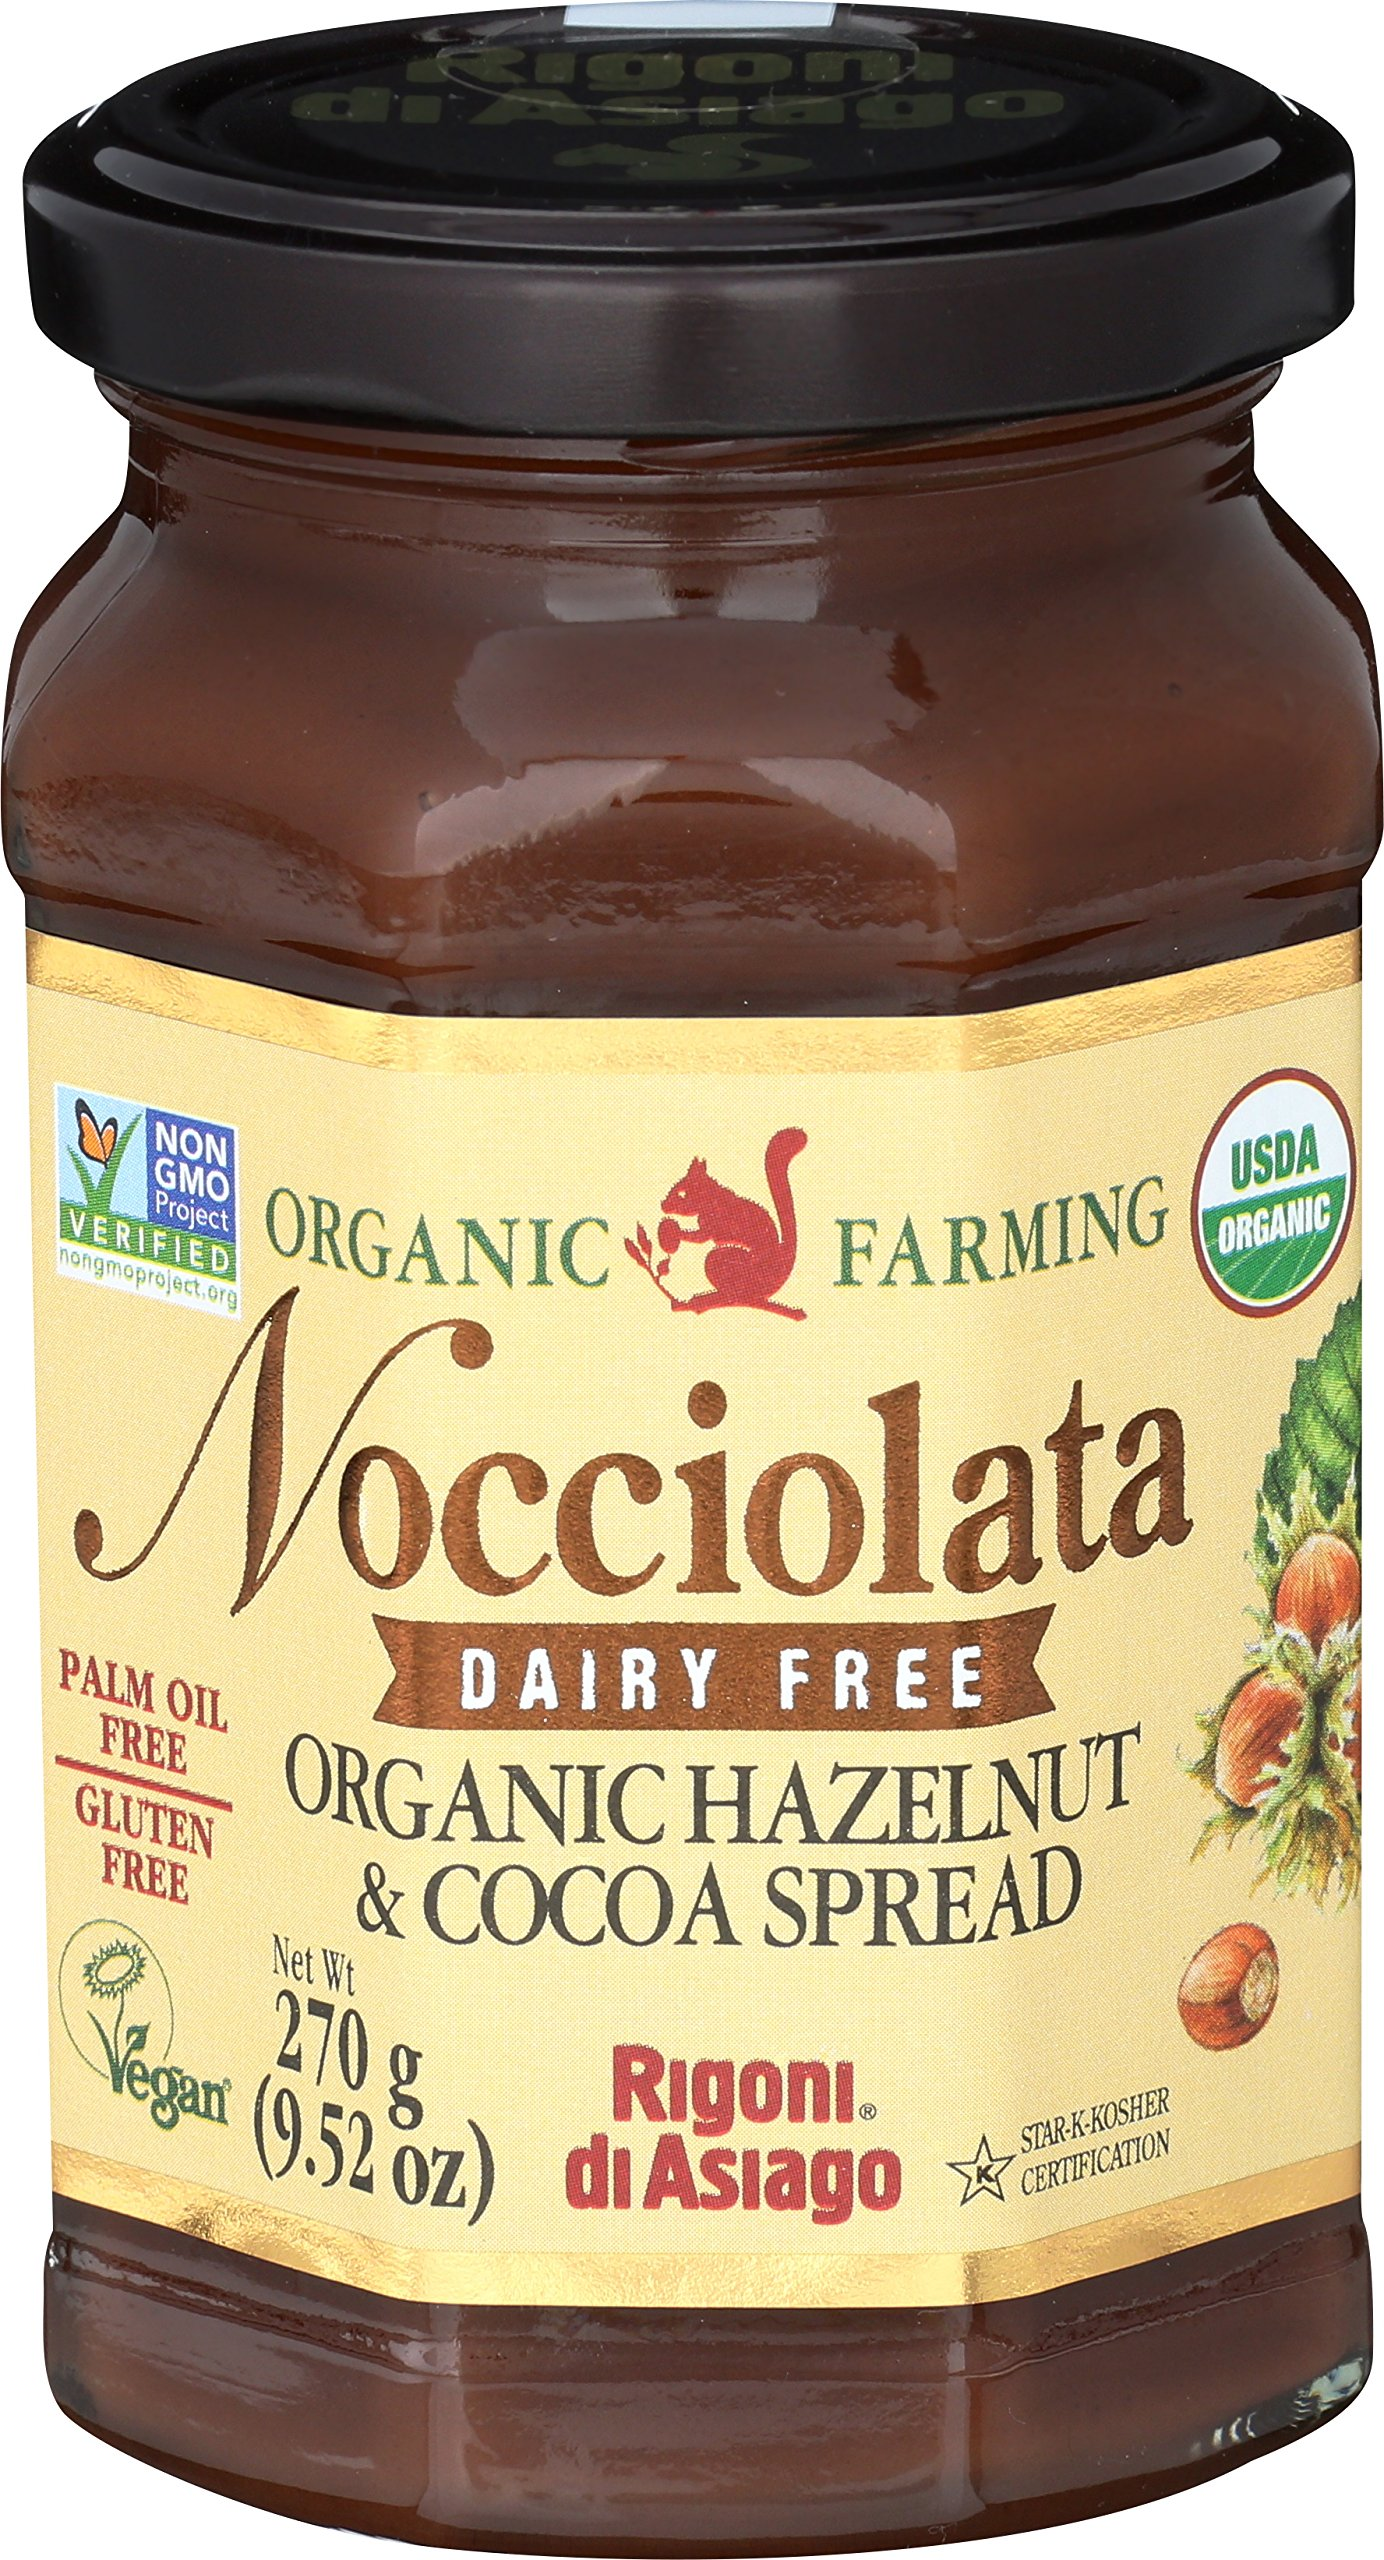 Rigoni Di Asiago Nocciolata DAIRY FREE Organic Hazelnut & Cocoa Spread, 9.52 Ounce Jar (Hazelnut Cocoa, 6 Pack)